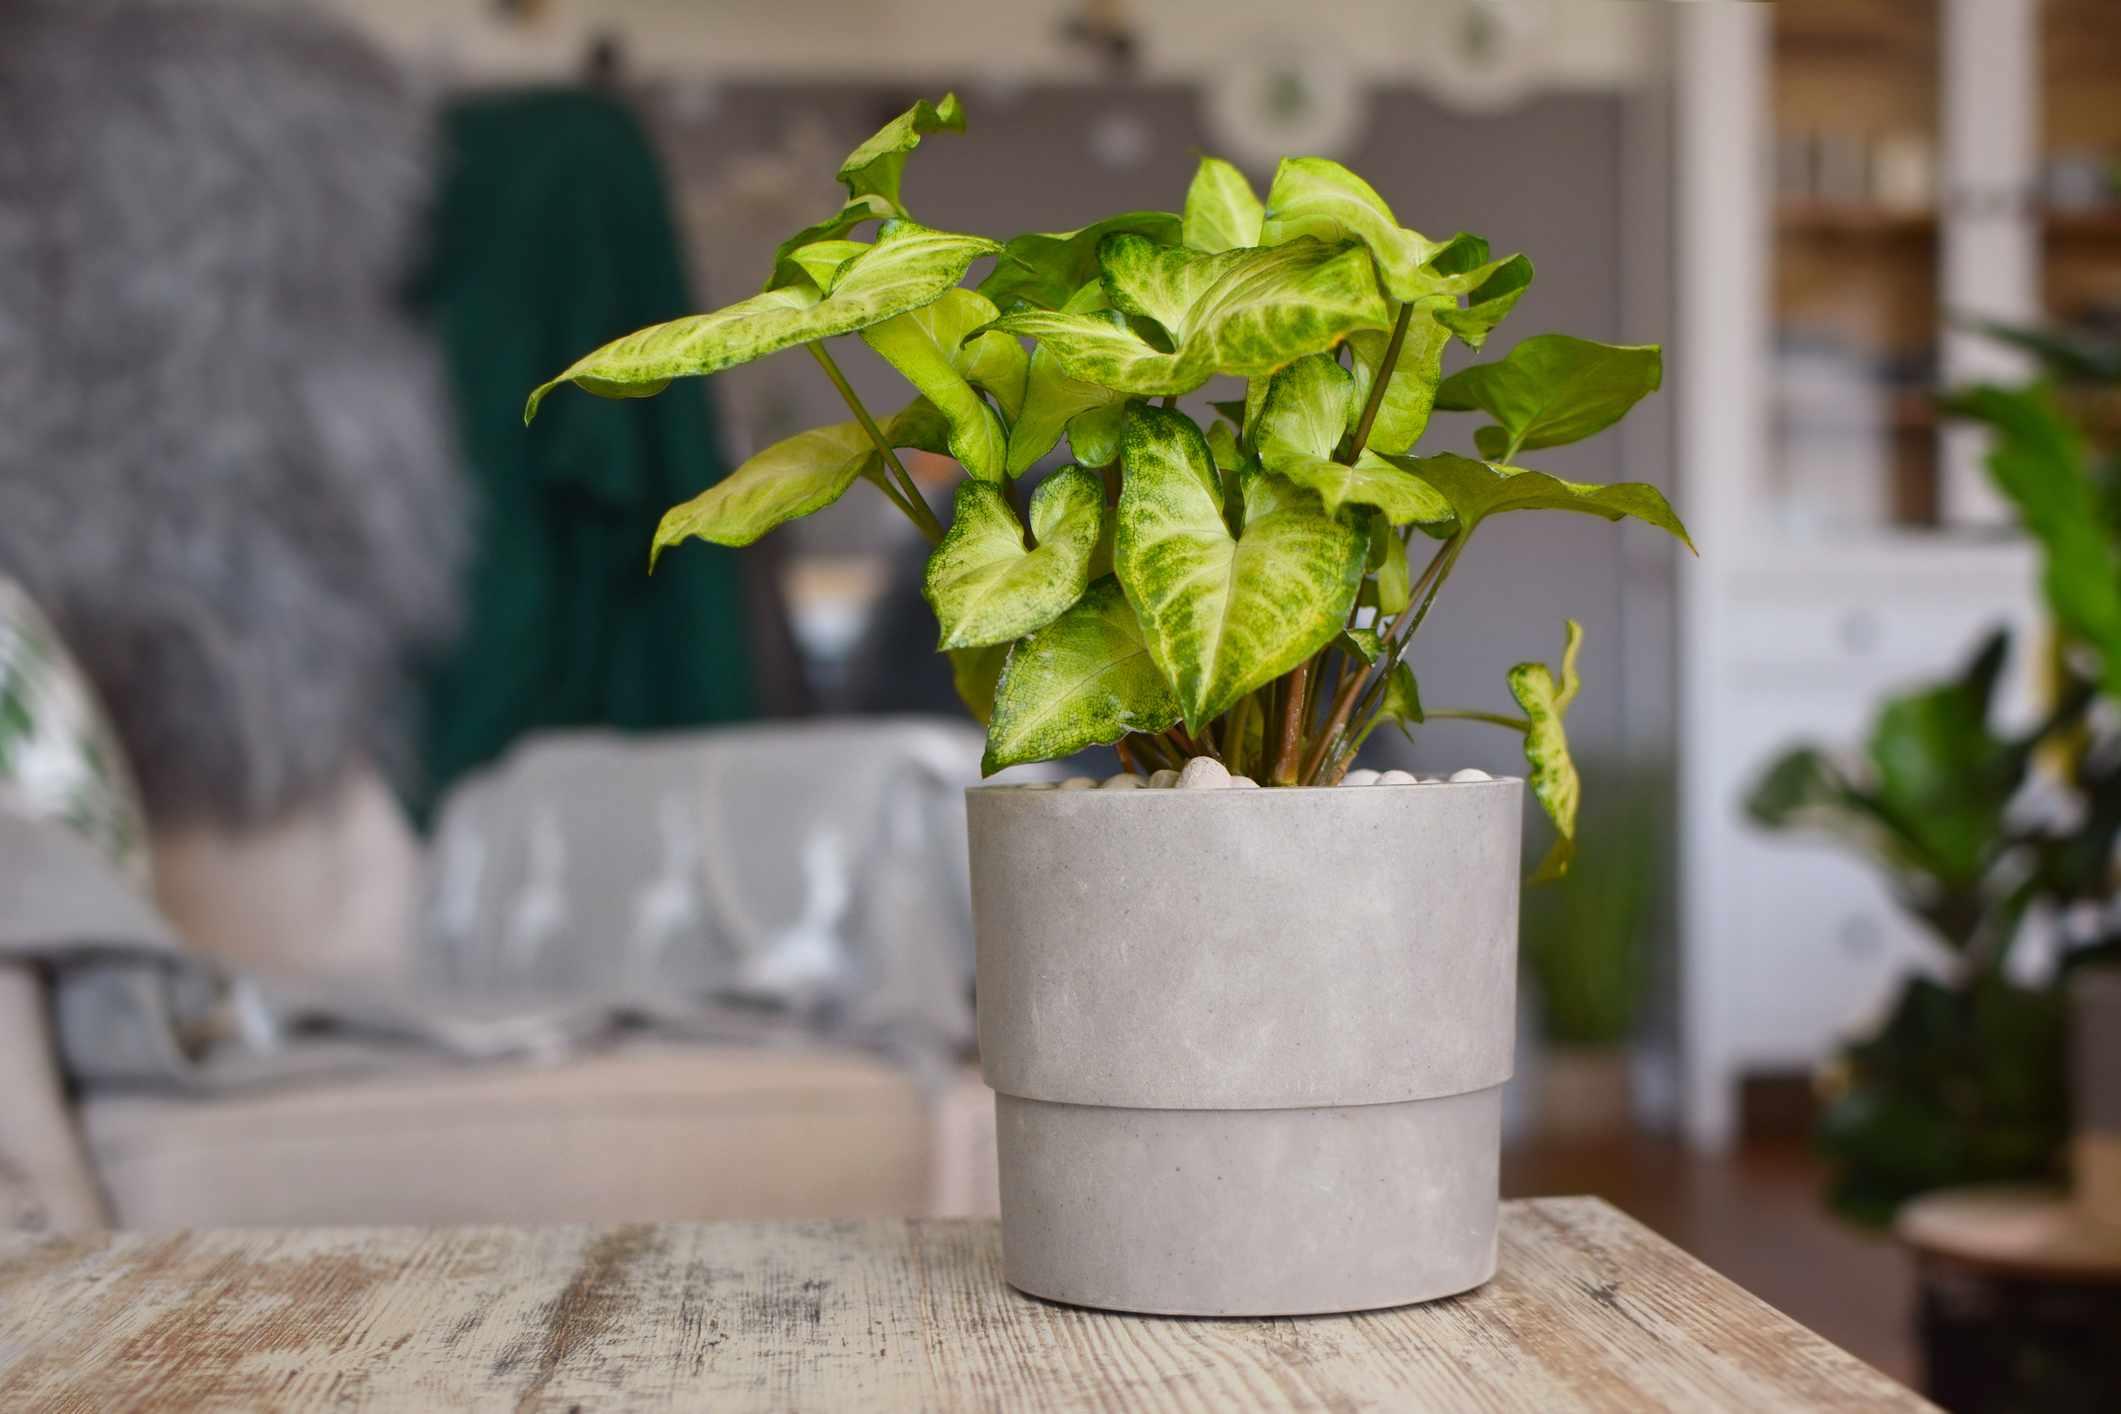 Arrowhead plant in a pot on the table